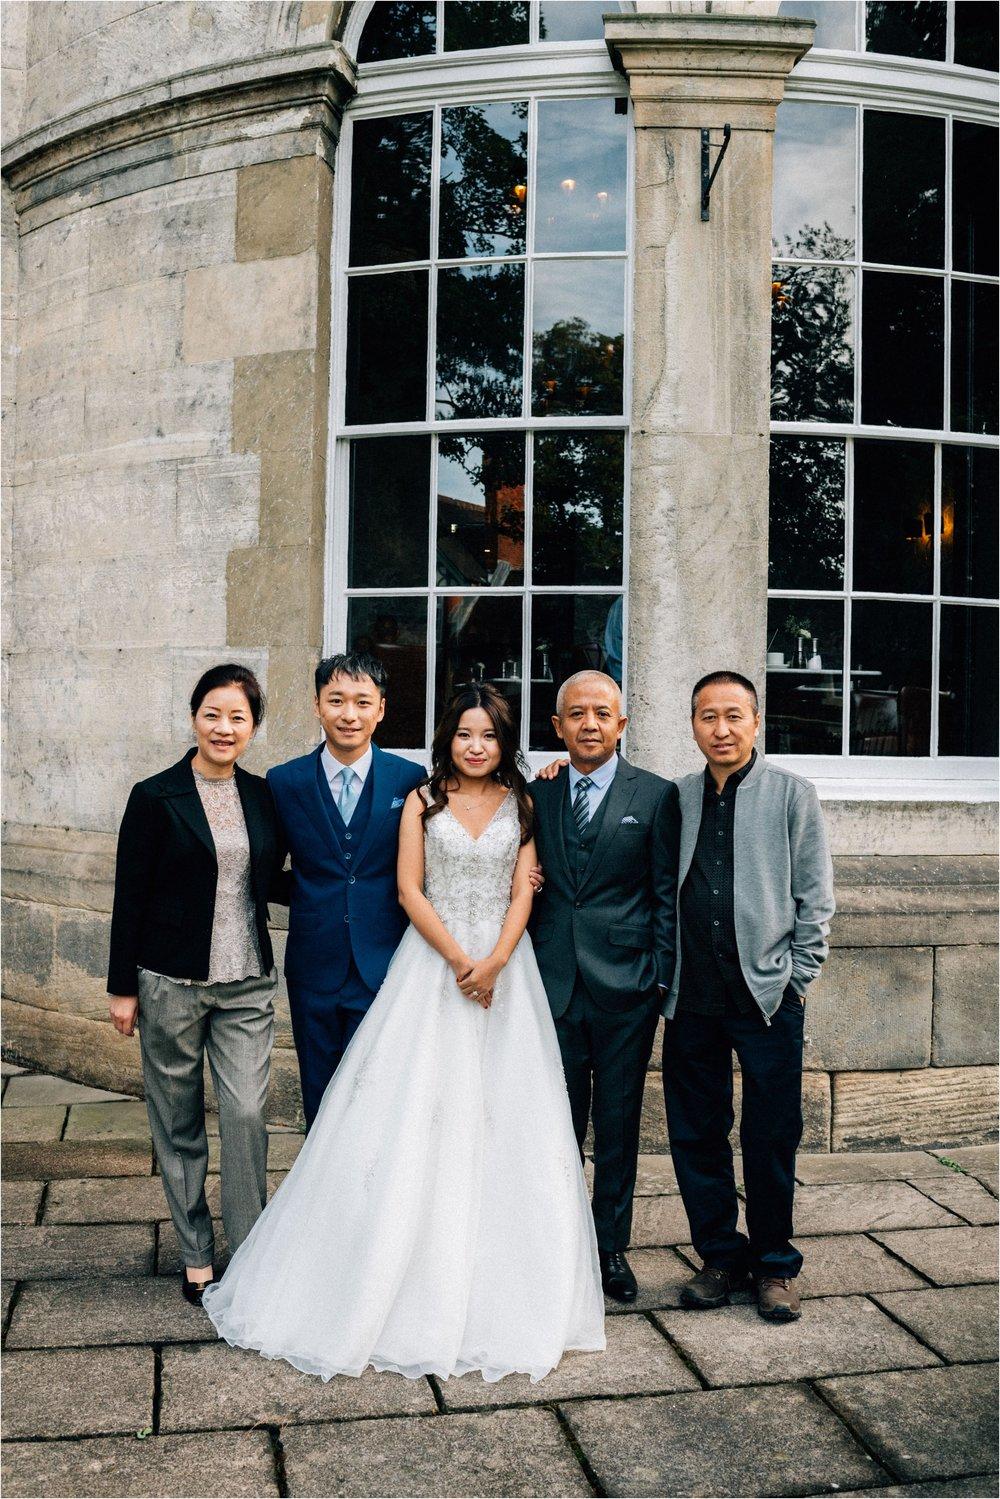 York city elopement wedding photographer_0033.jpg